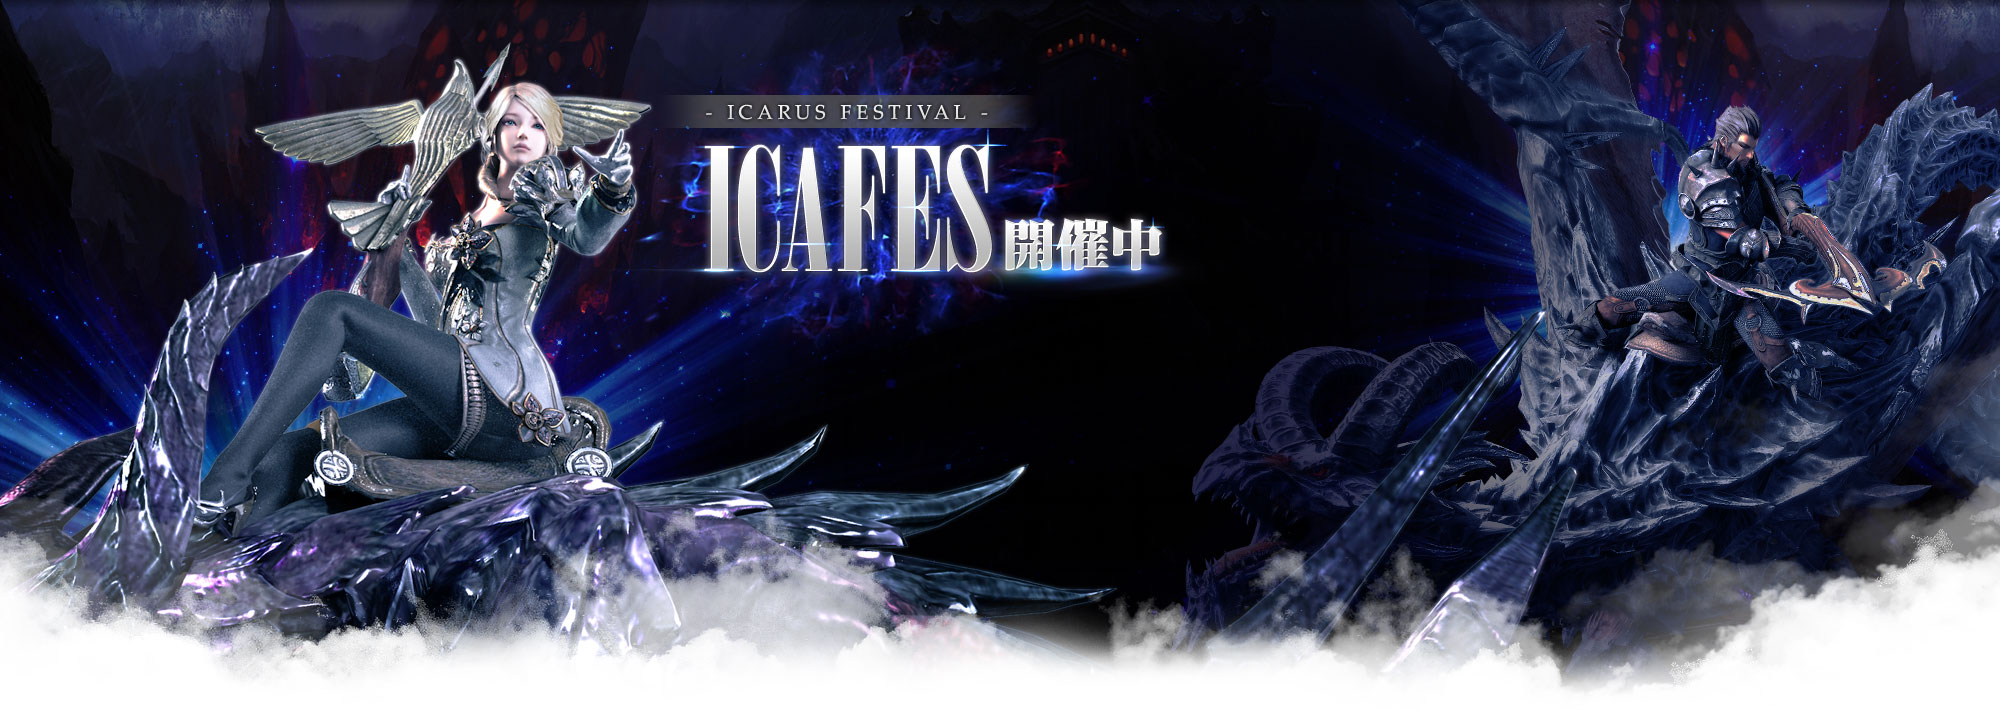 ICAFES